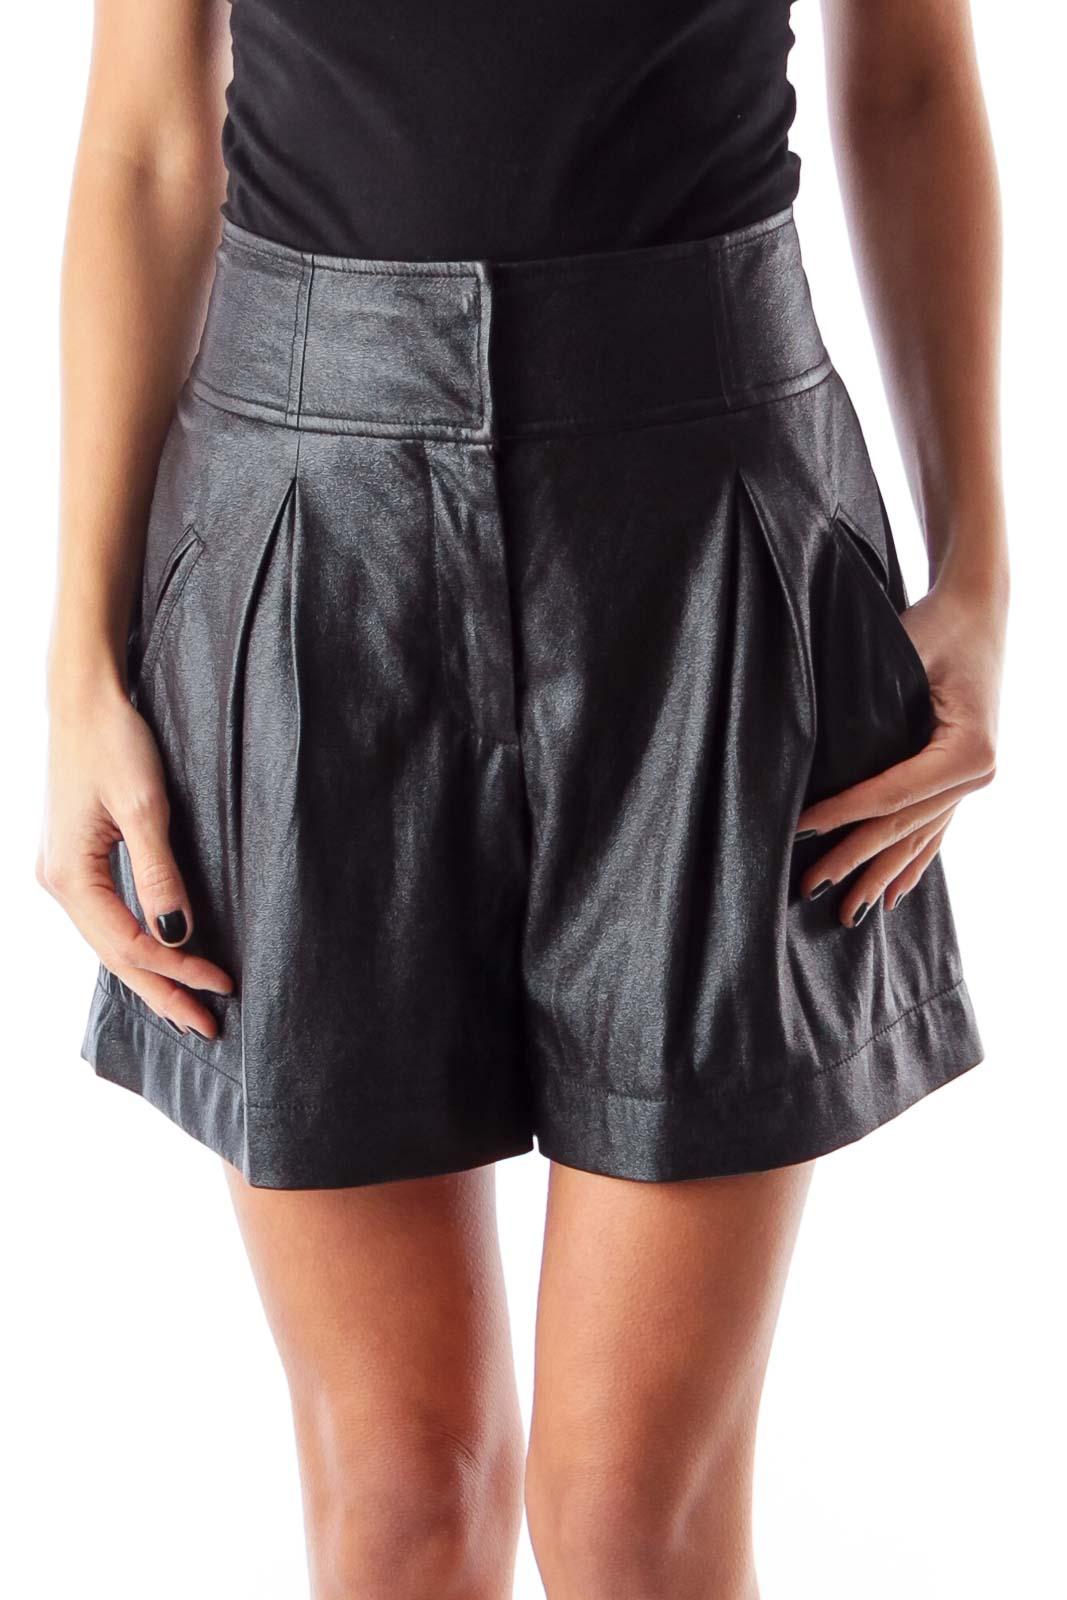 Black Faux Leather Shorts Front